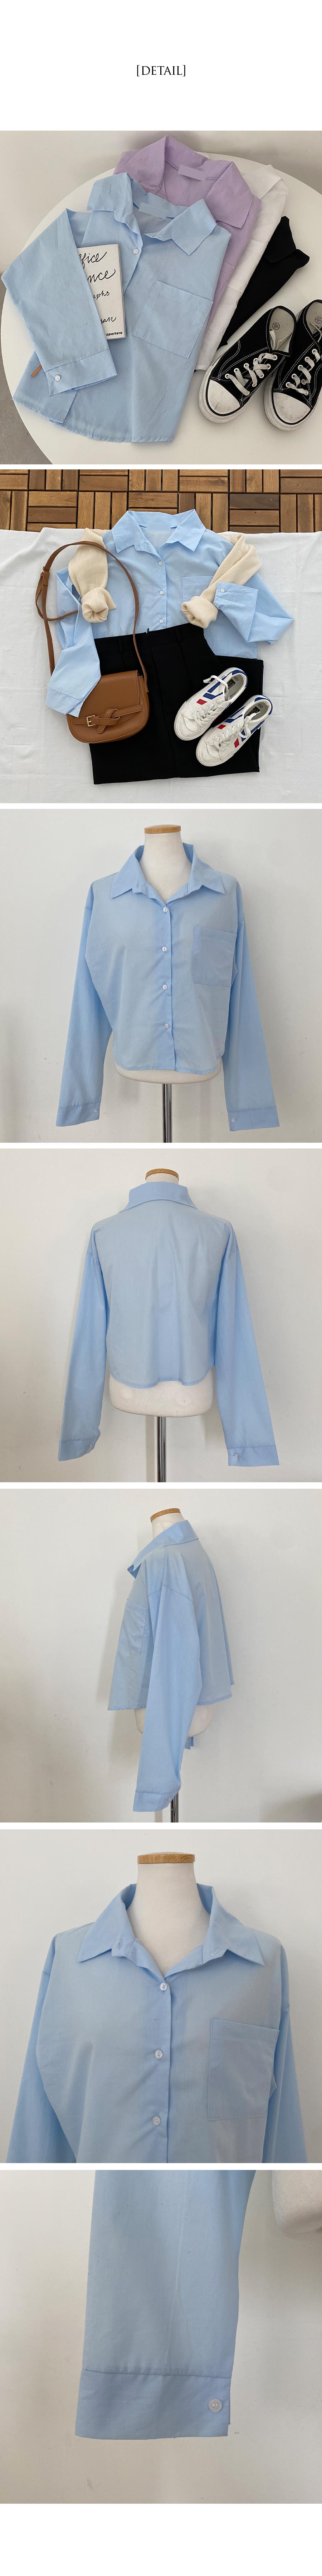 Peel cropped pocket Shirt shirt